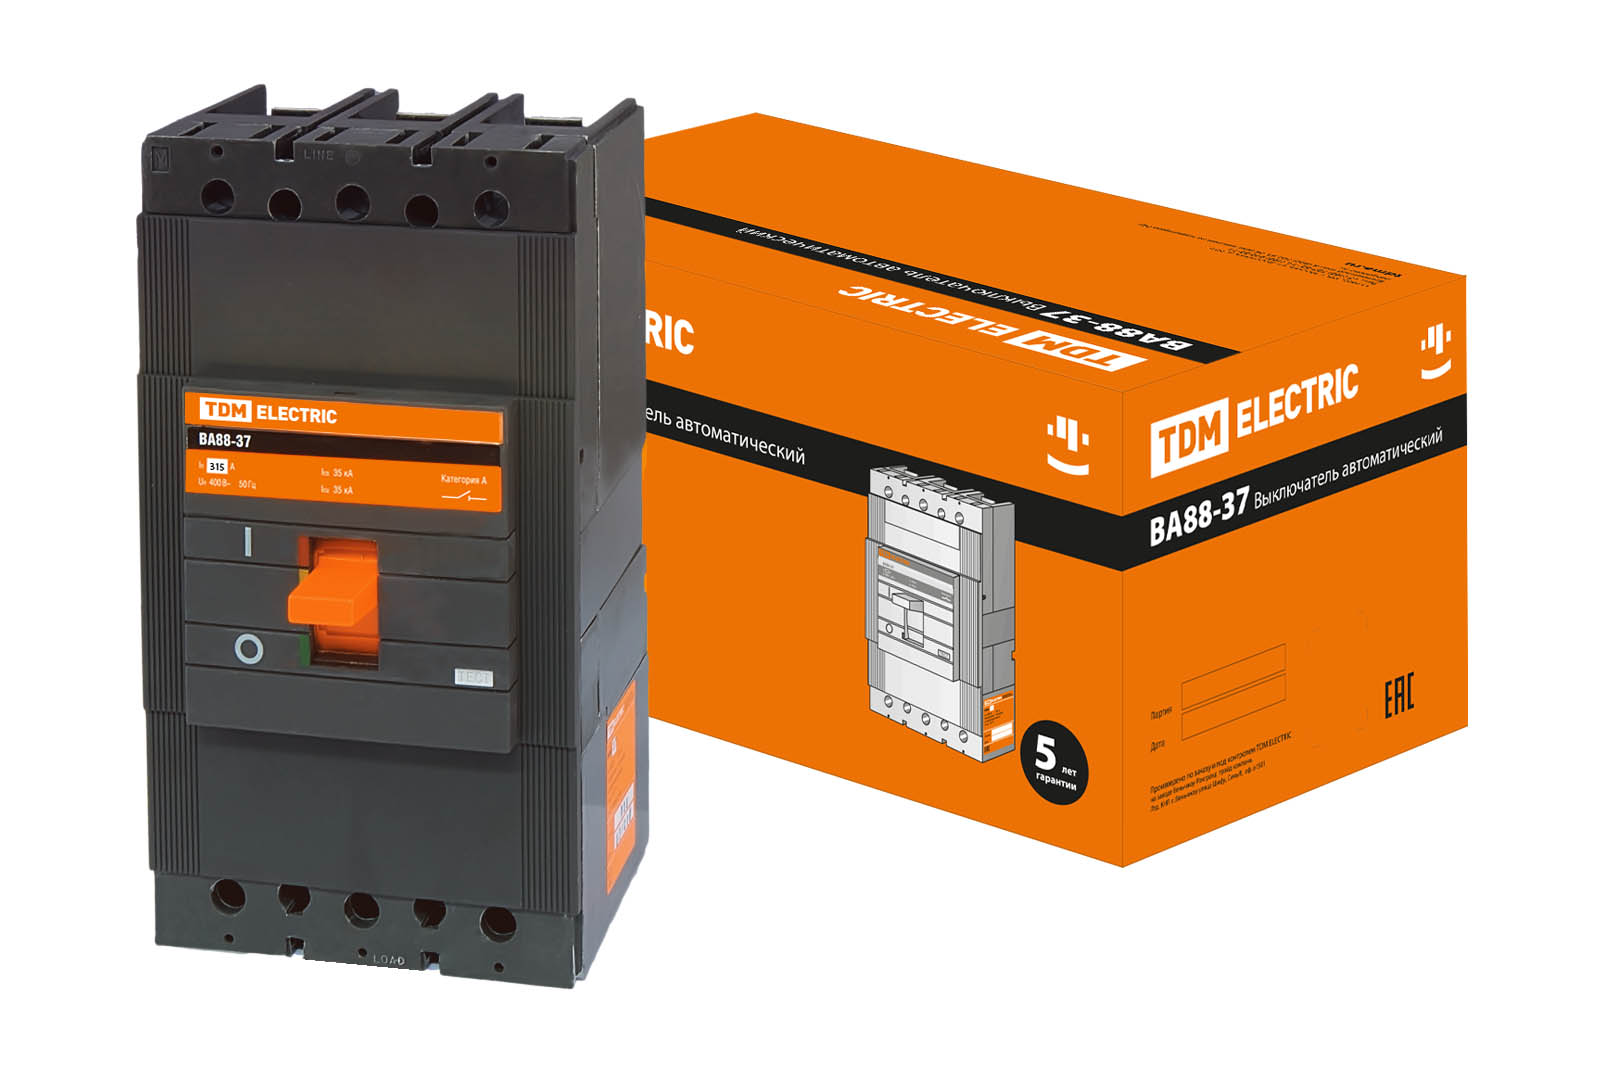 Автомат Tdm Sq0707-0019 фотореле tdm фрл 11 sq0324 0019